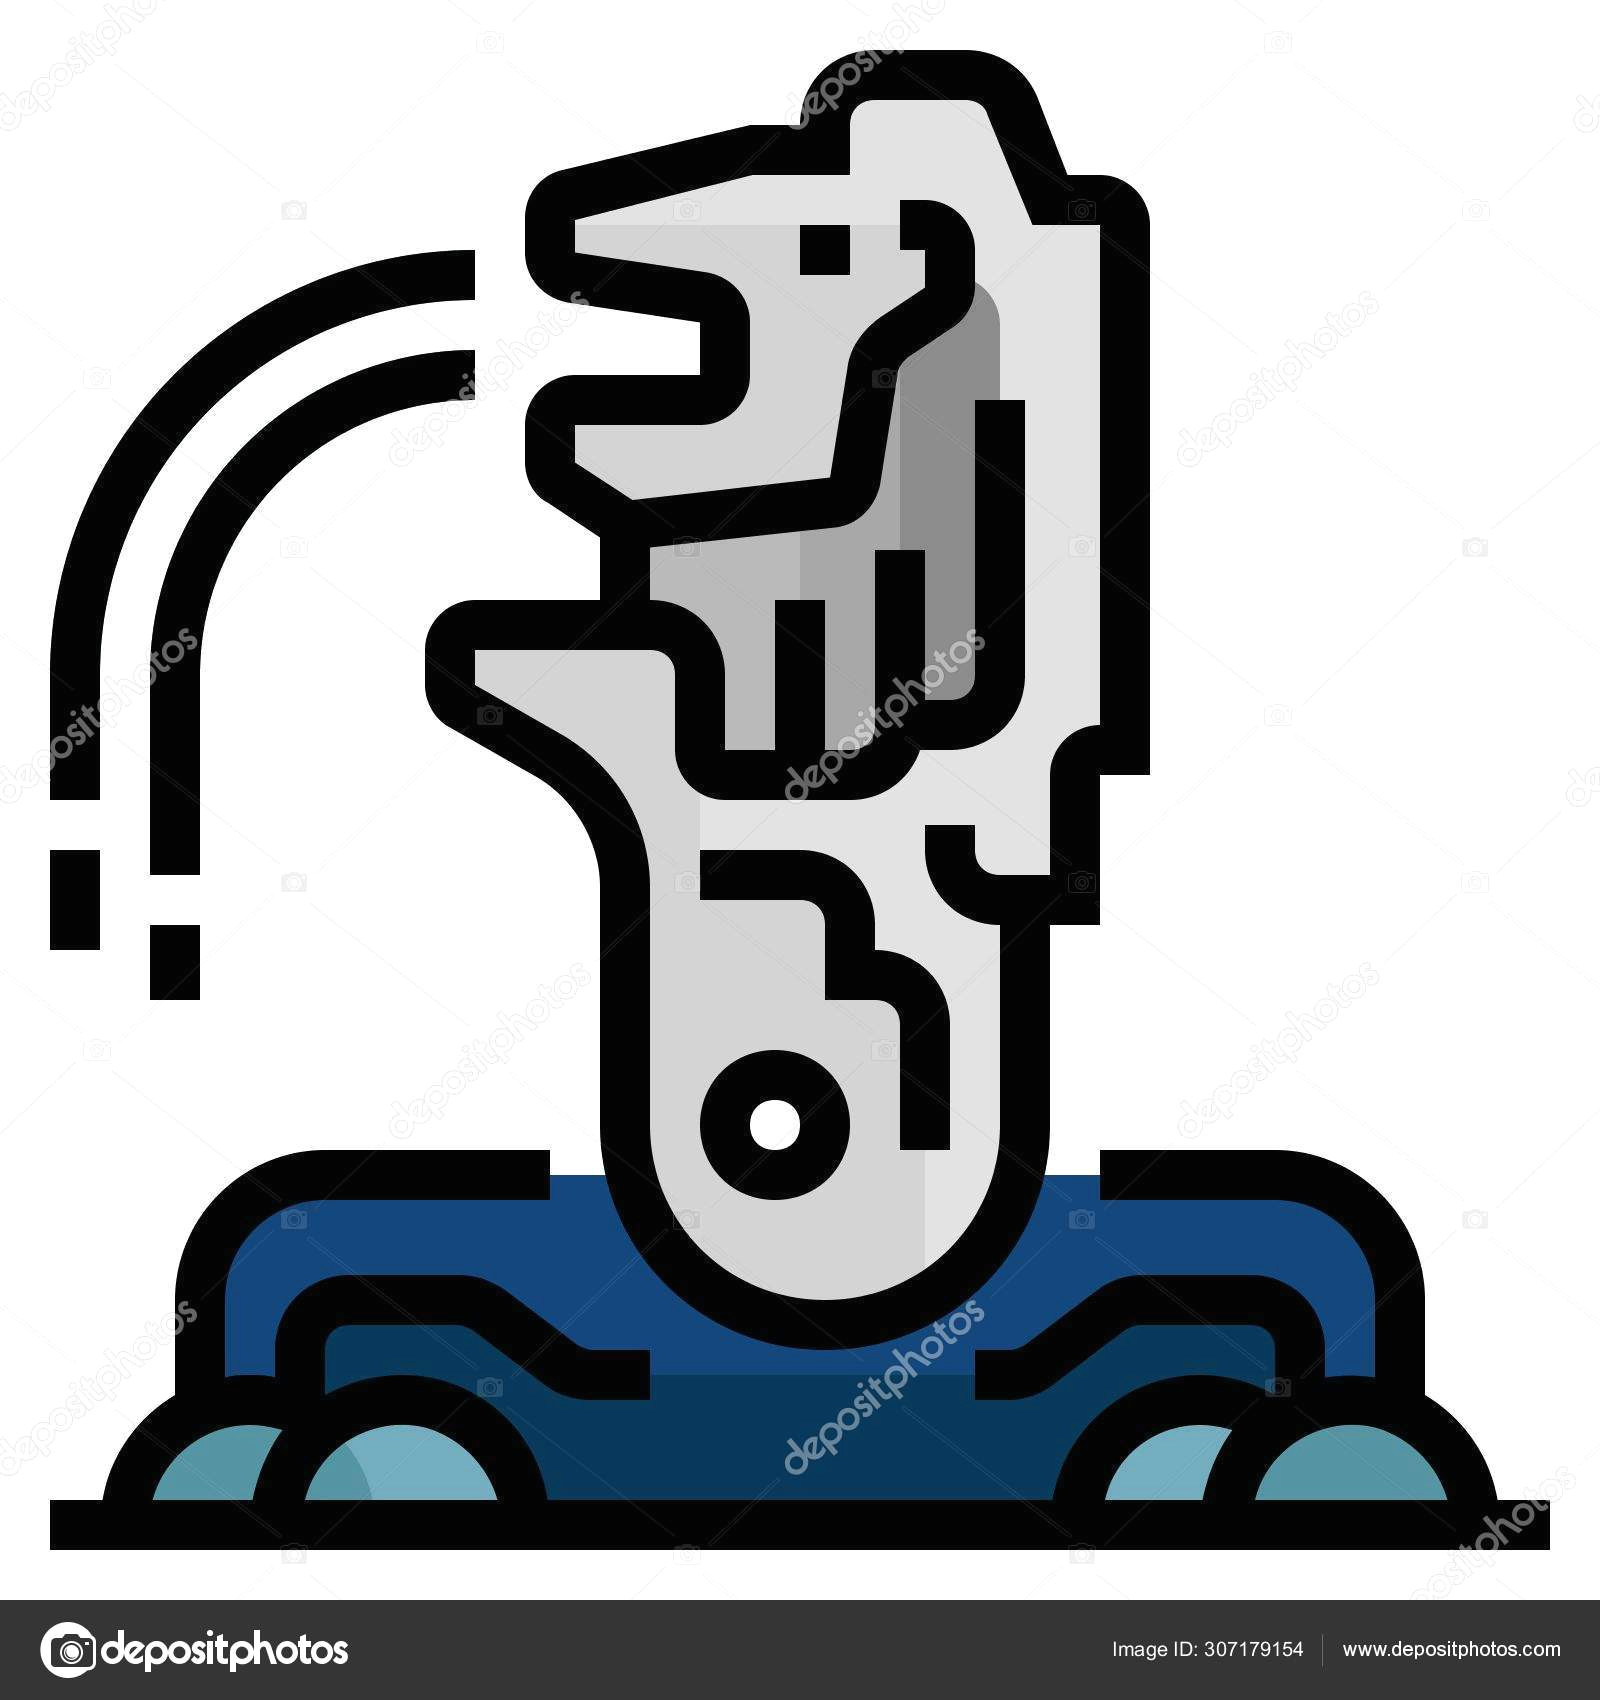 depositphotos 307179154 stock illustration merlion web icon simple design jpg